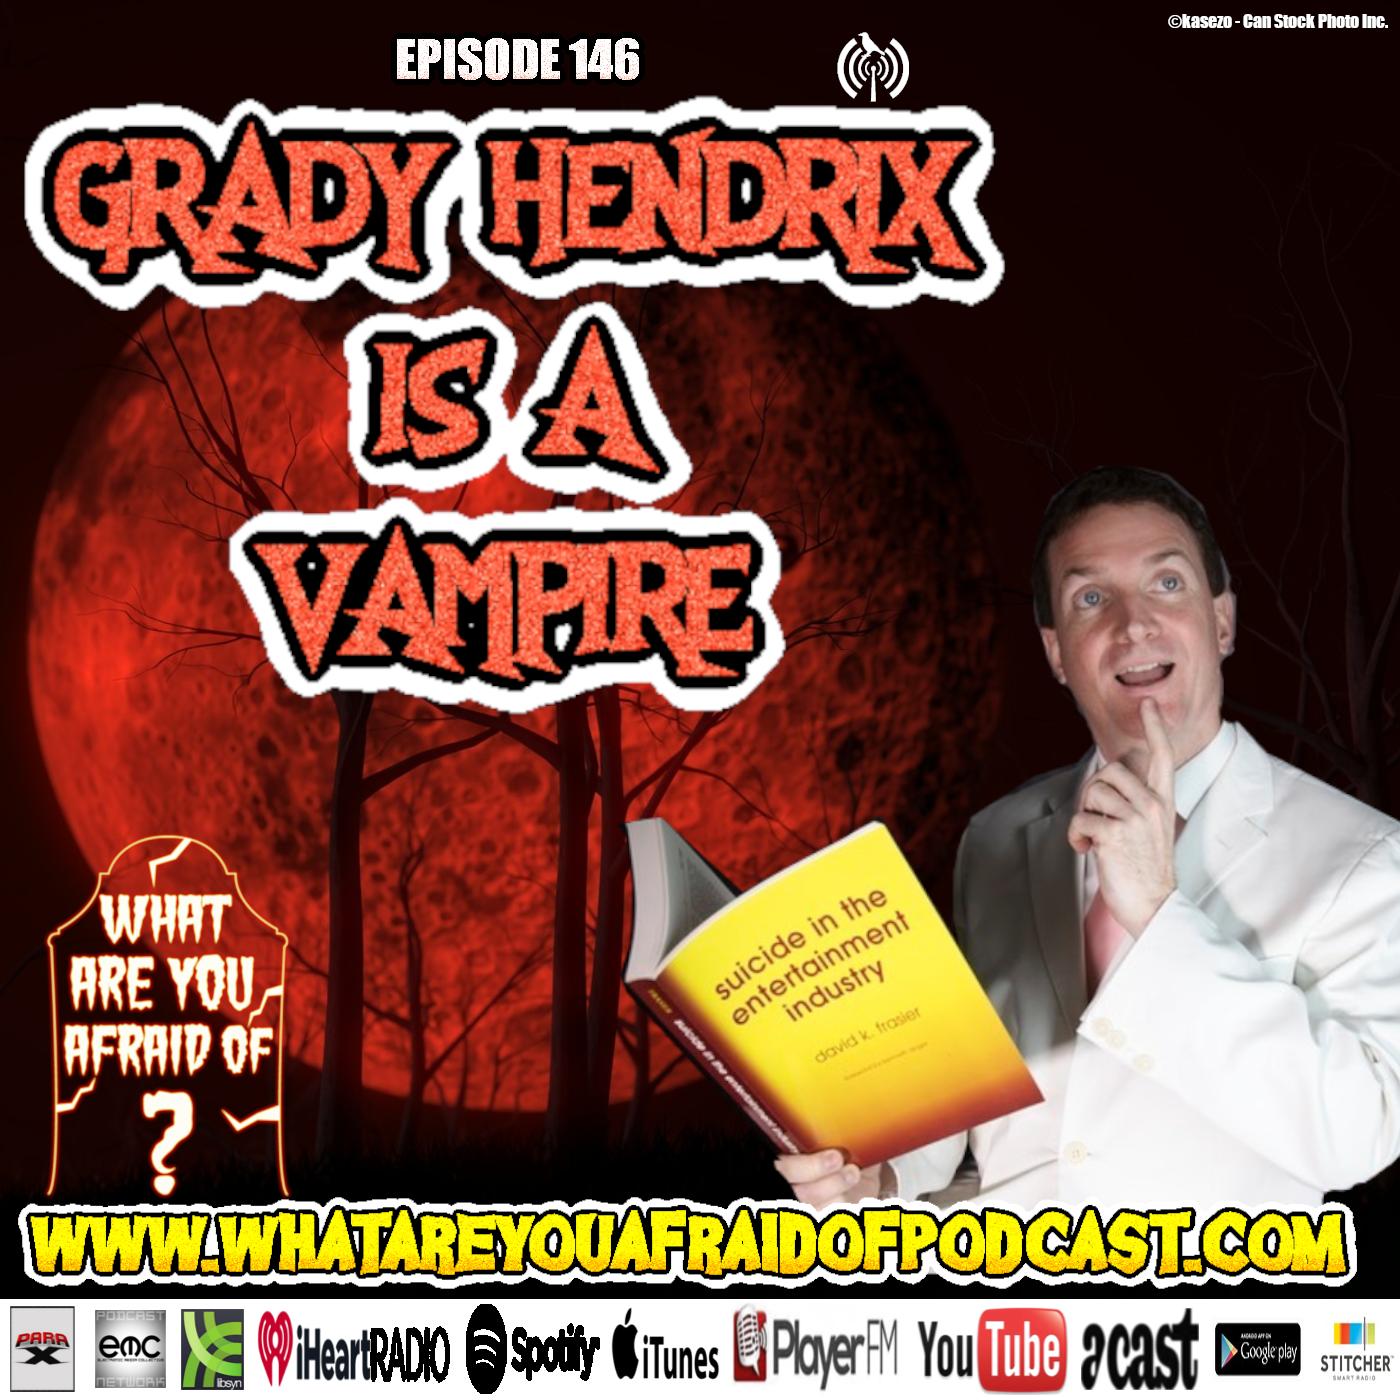 146 - GRADY HENDRIX IS A VAMPIRE